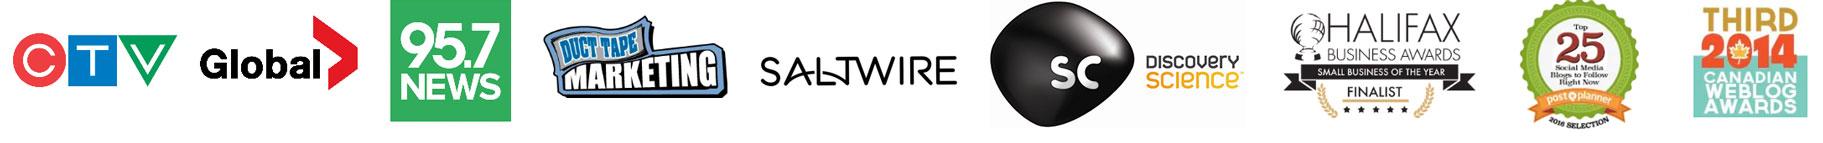 Twirp-Communications-As-Seen-In-Strip-3